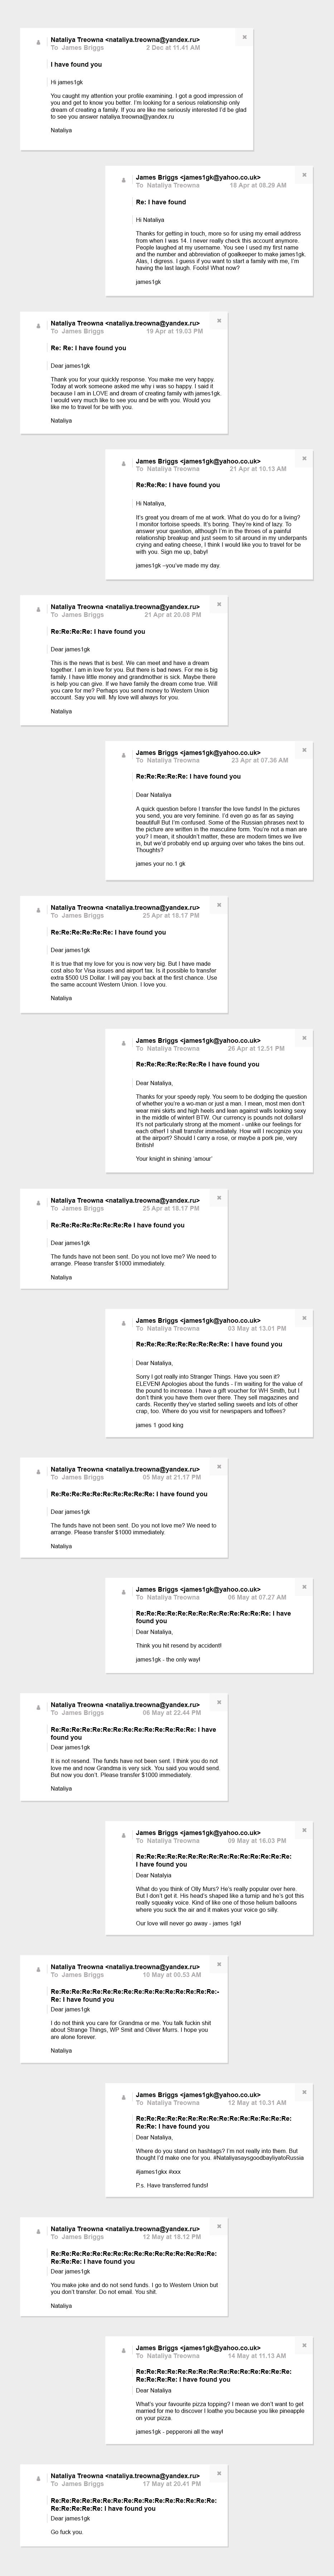 james email natalyia